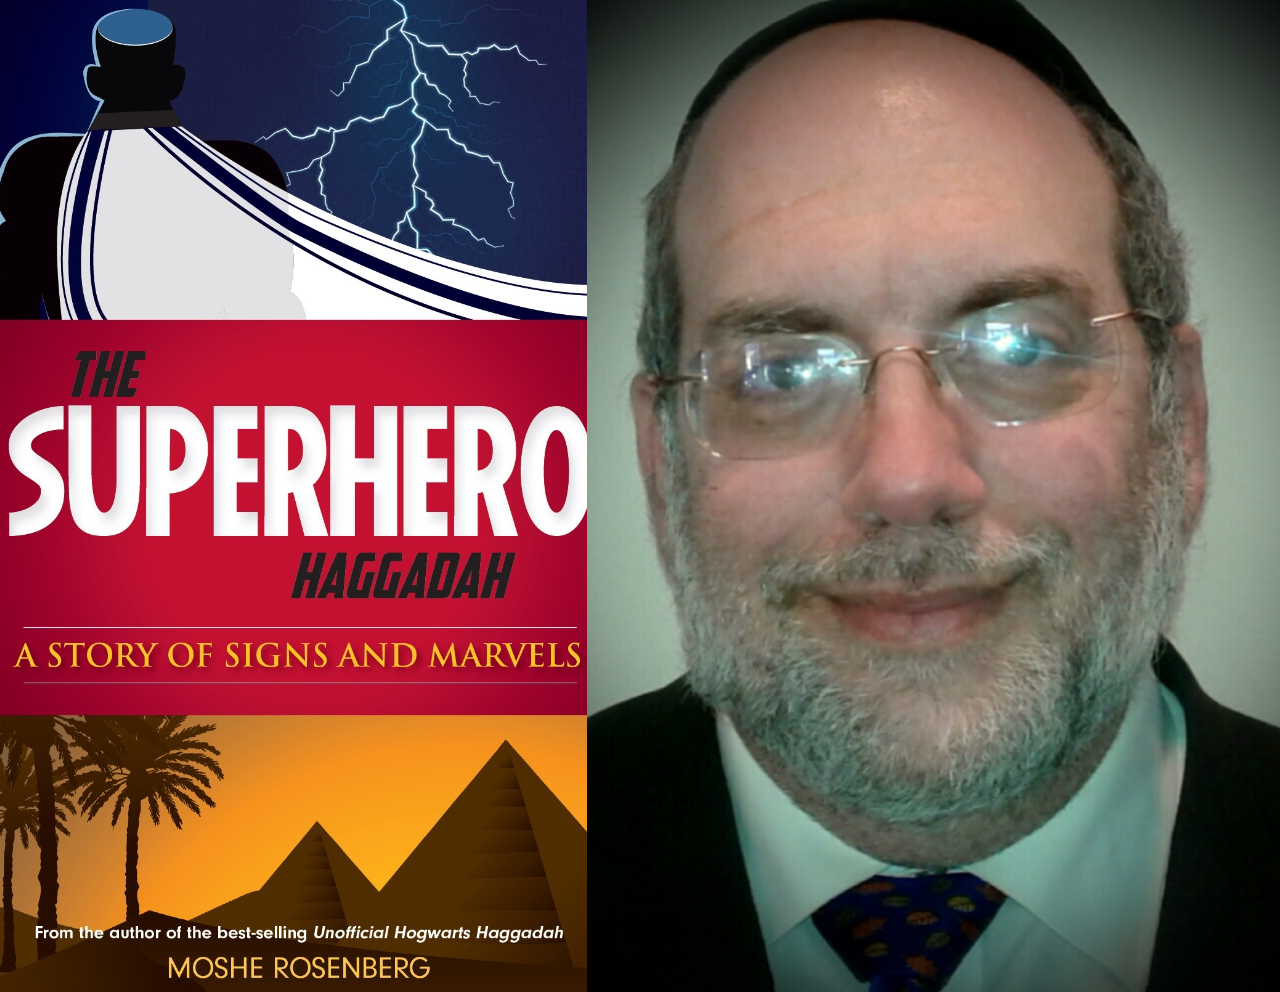 Moshe Rosenberg On His New Superhero Haggadah